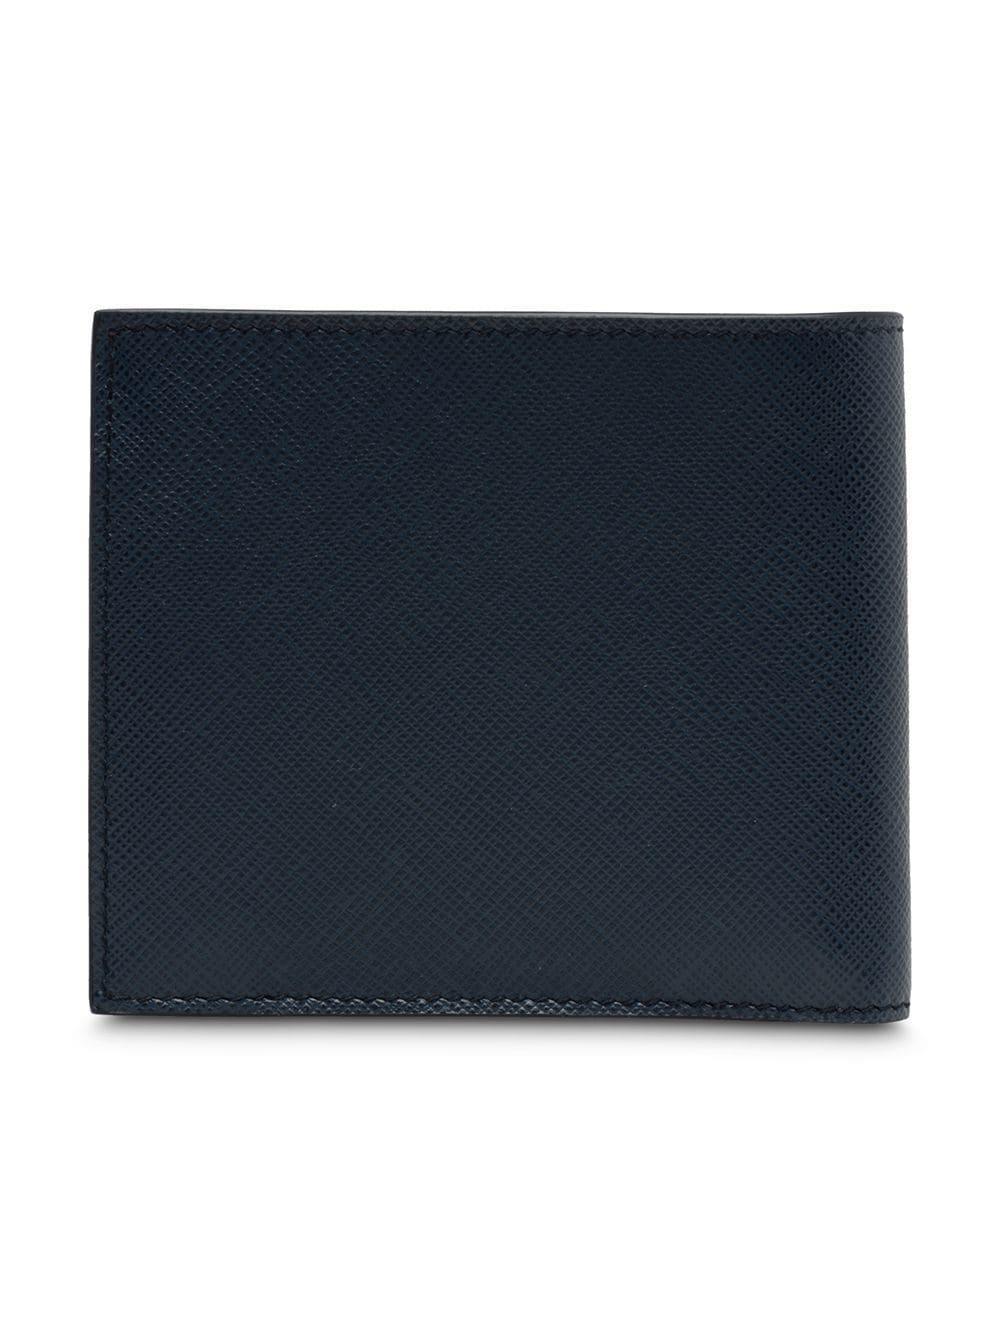 77d5db159326 Prada - Blue Logo Plaque Wallet for Men - Lyst. View fullscreen